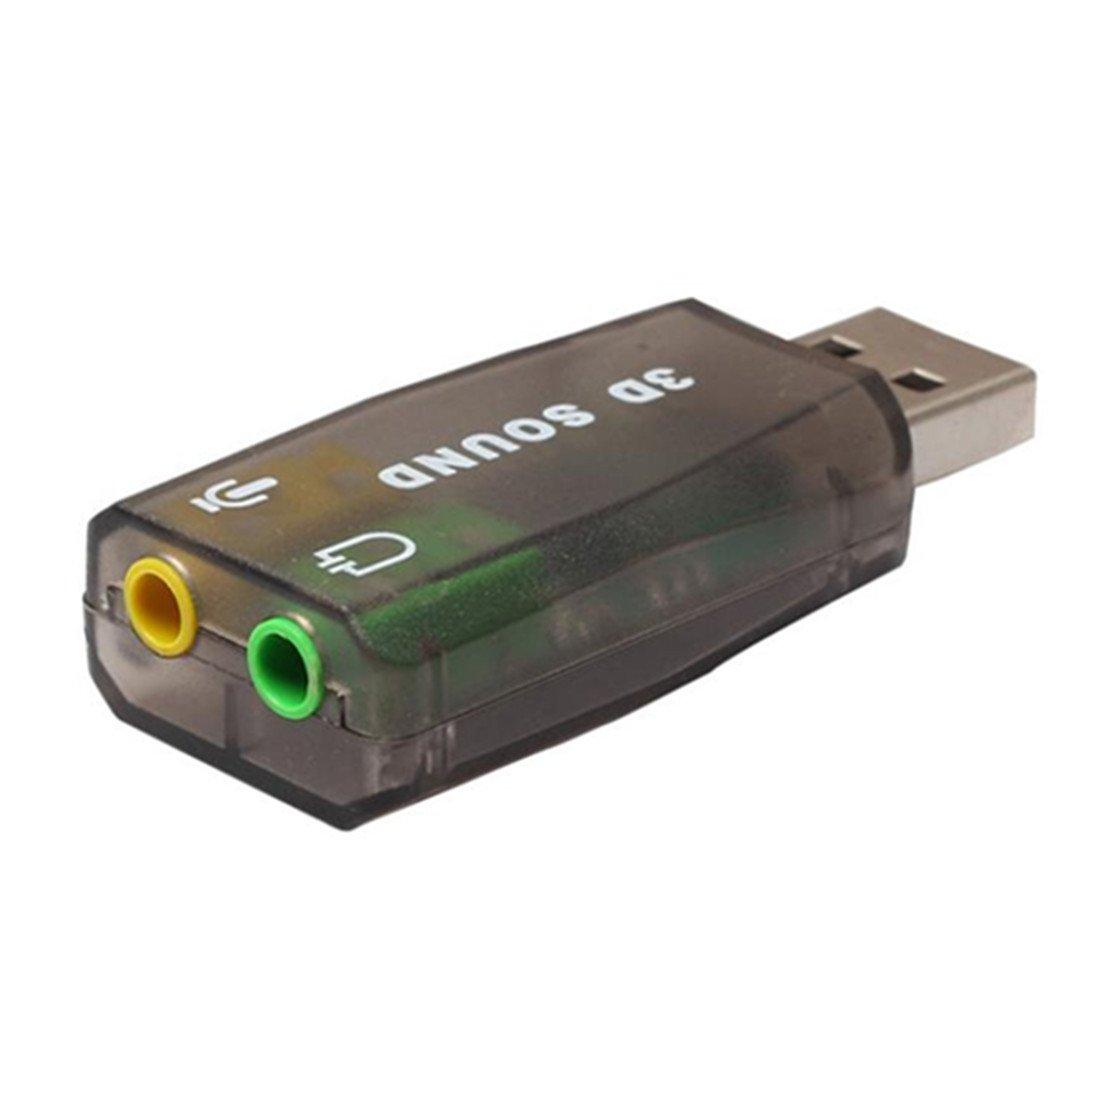 Bestpriceam 5.1 USB to 3.5mm mic Headphone Jack Stereo Headset 3D Sound Card Audio Adapter Black Bestpriceam-0017